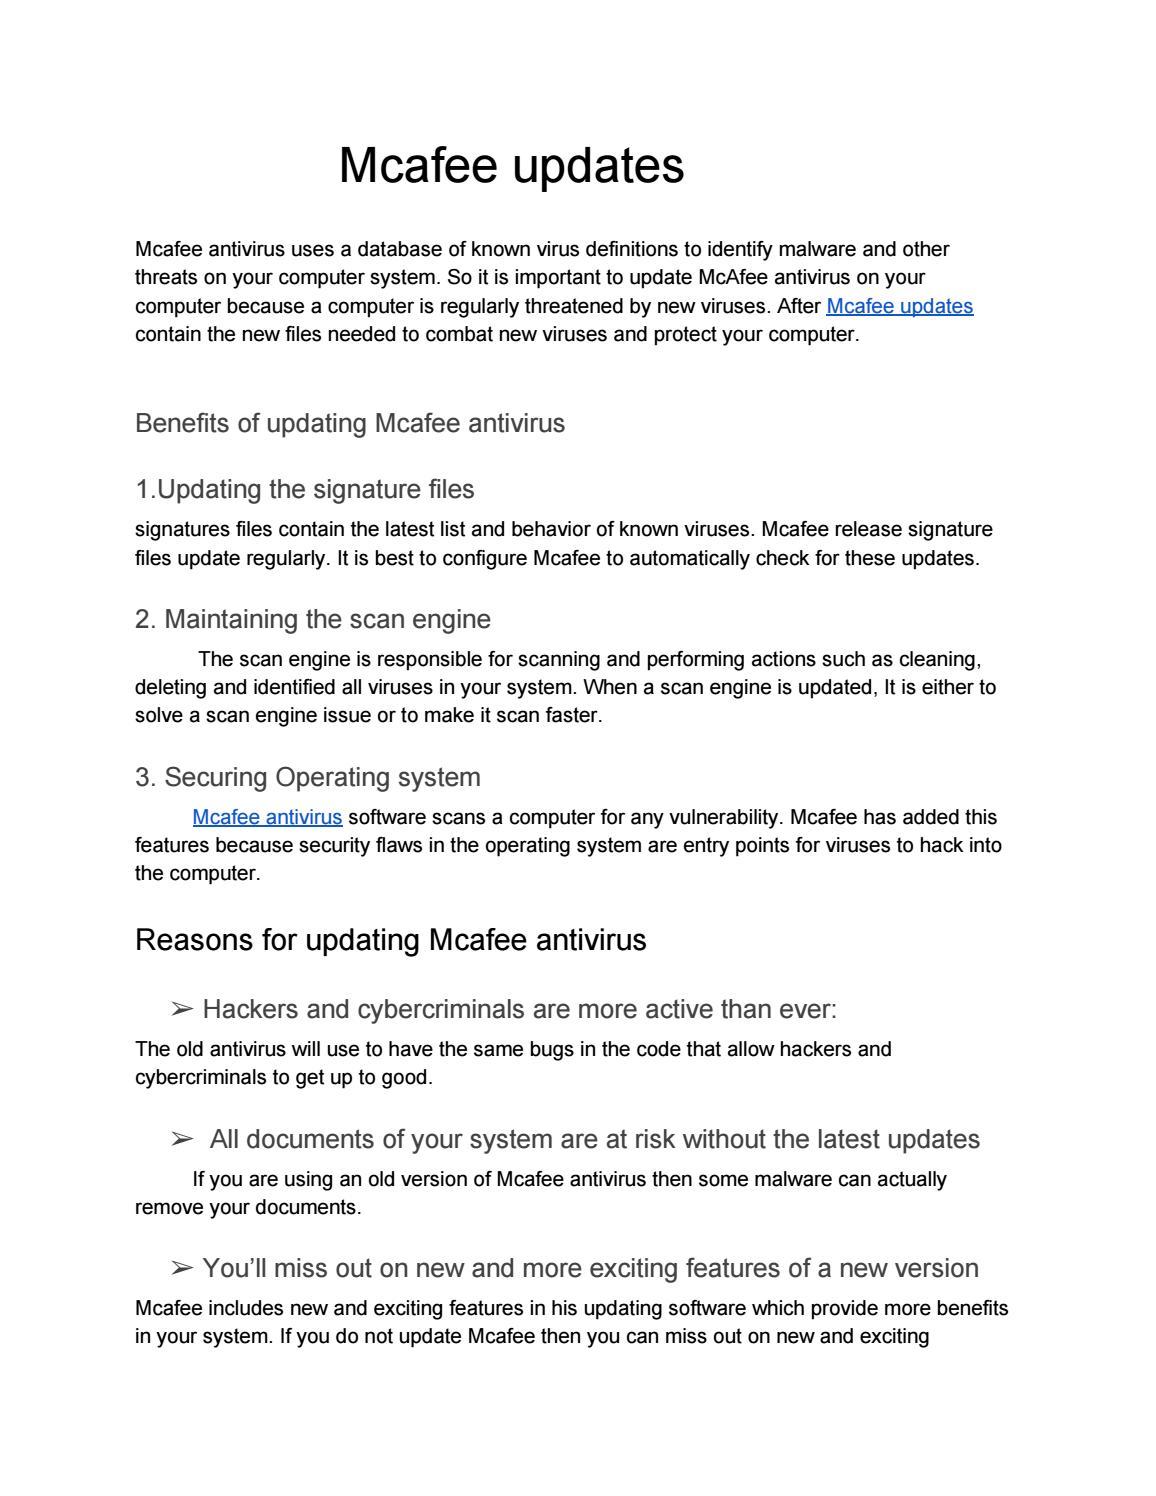 Mcafee virusscan enterprise 8. 7 i update download.